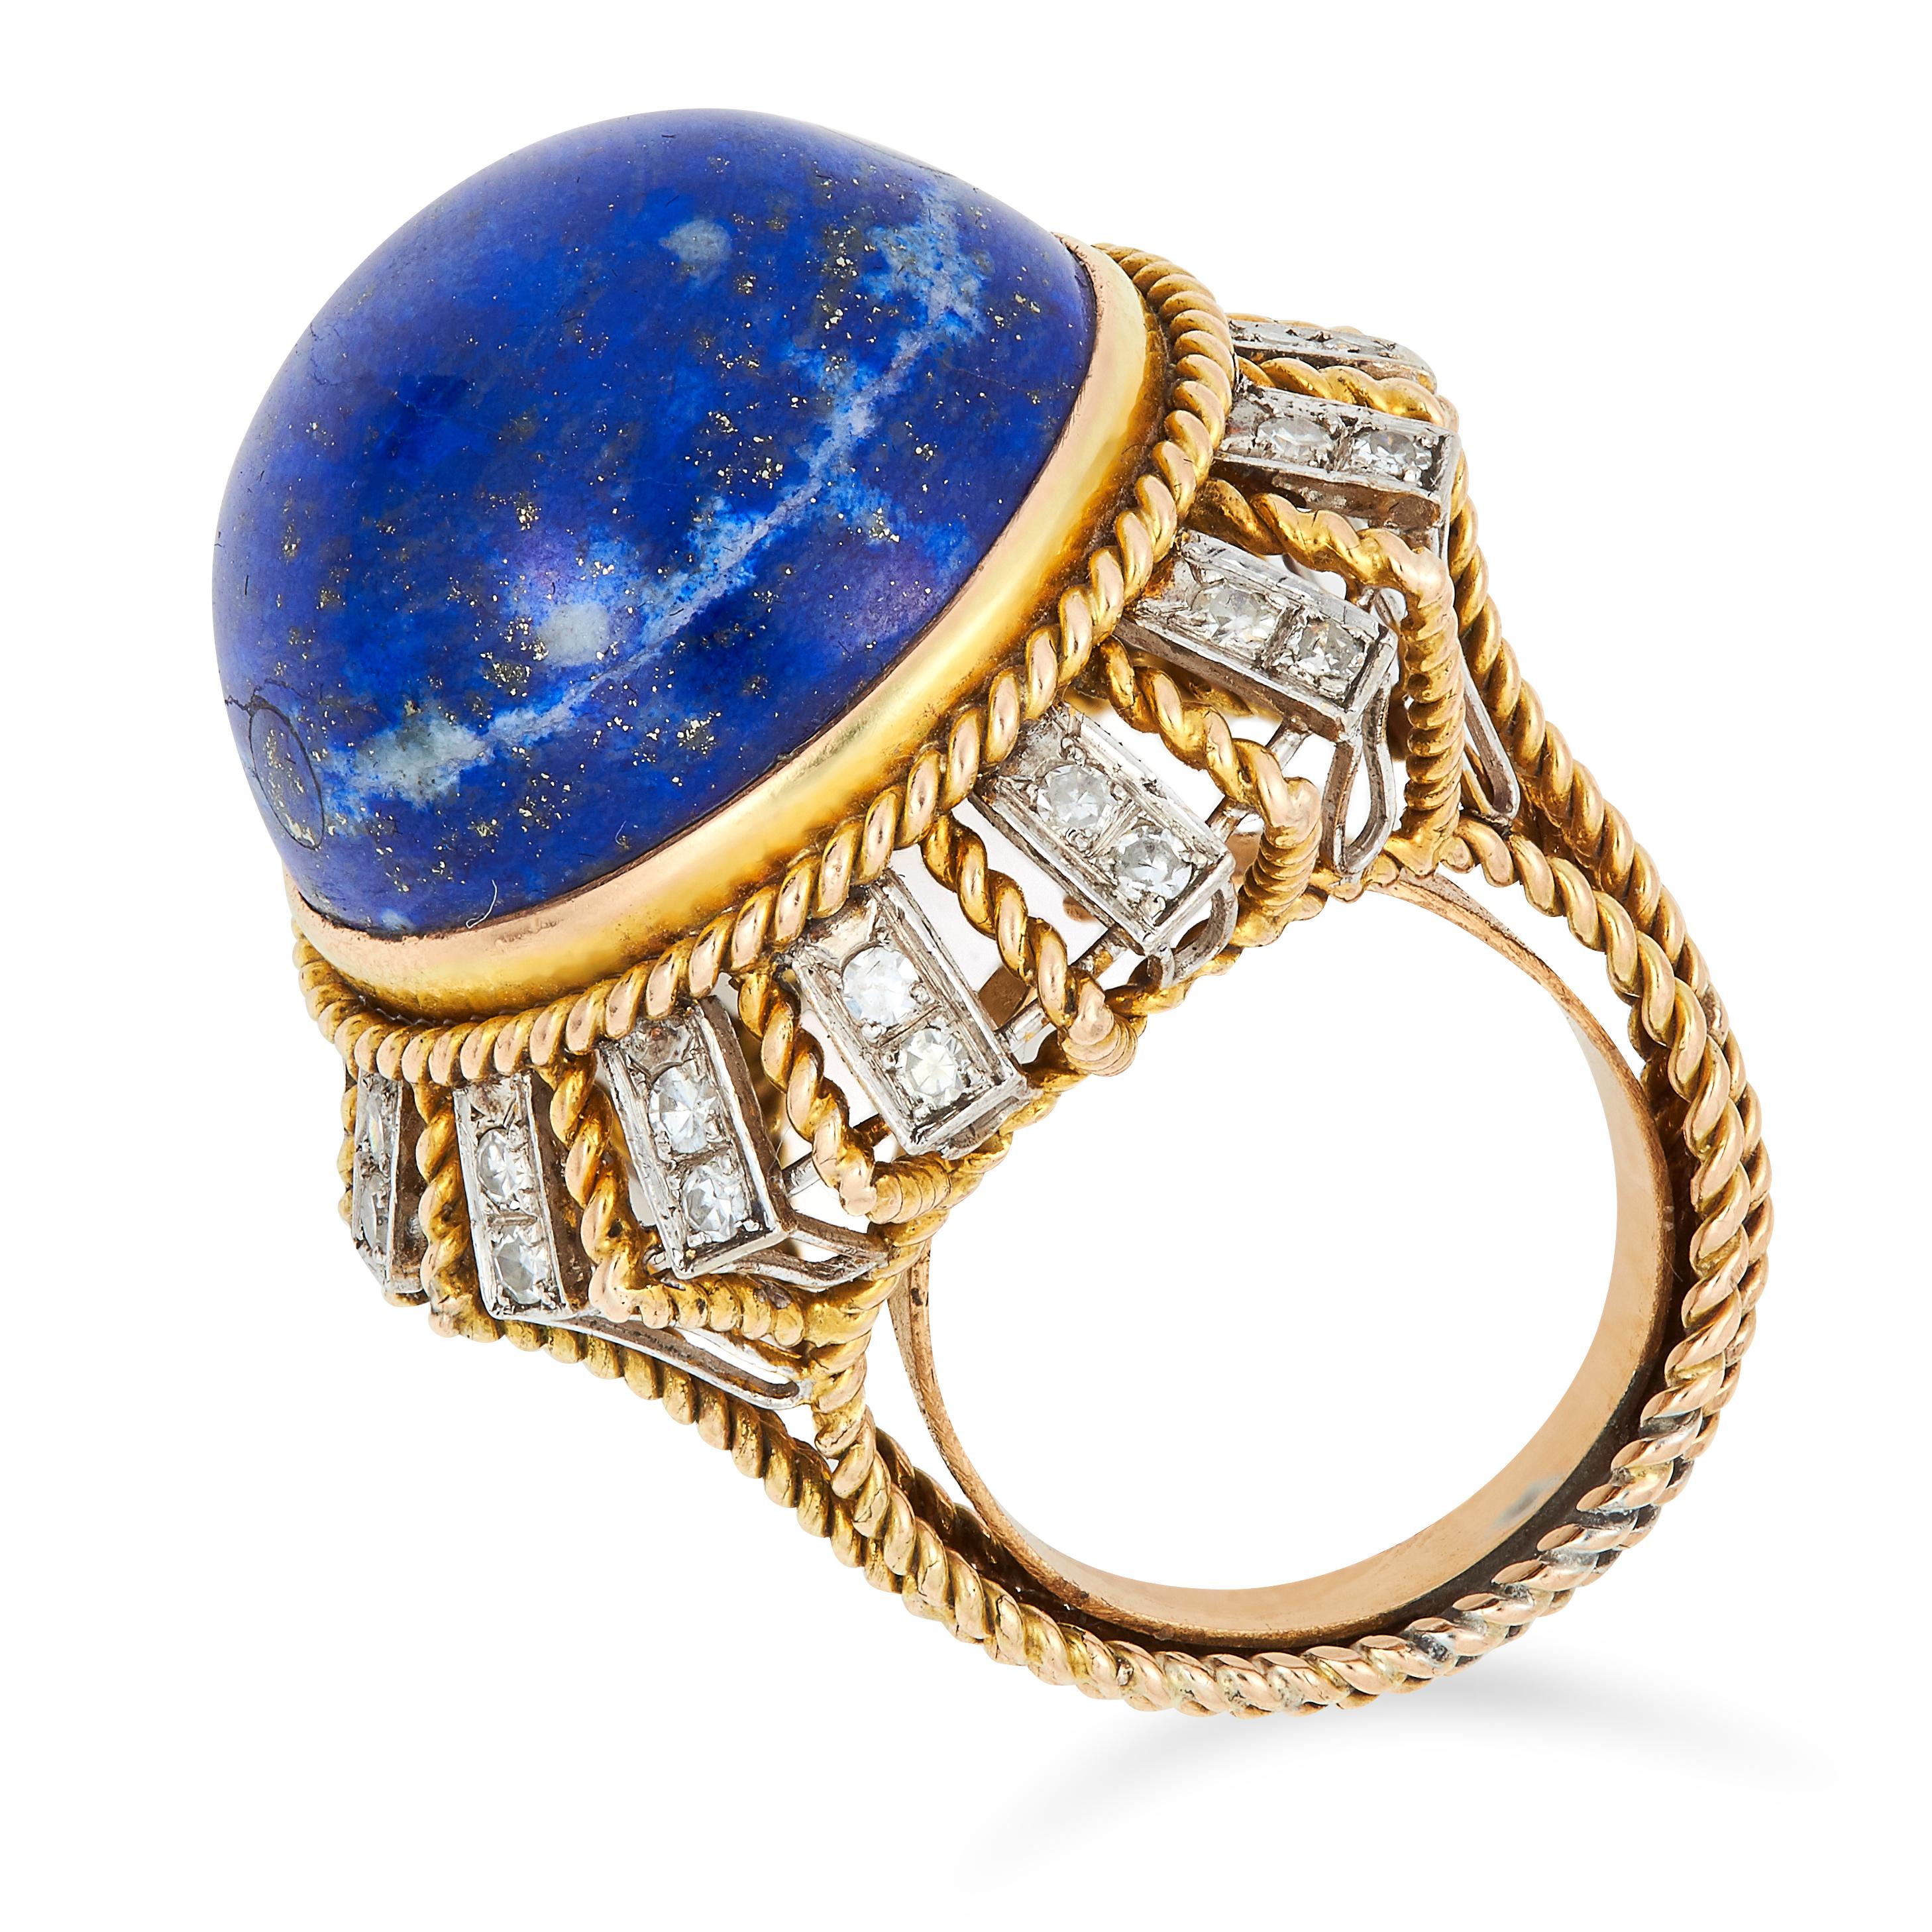 VINTAGE LAPIS LAZULI AND DIAMOND RING set with a circular lapis lazuli cabochon of 29.69 carats - Image 2 of 2